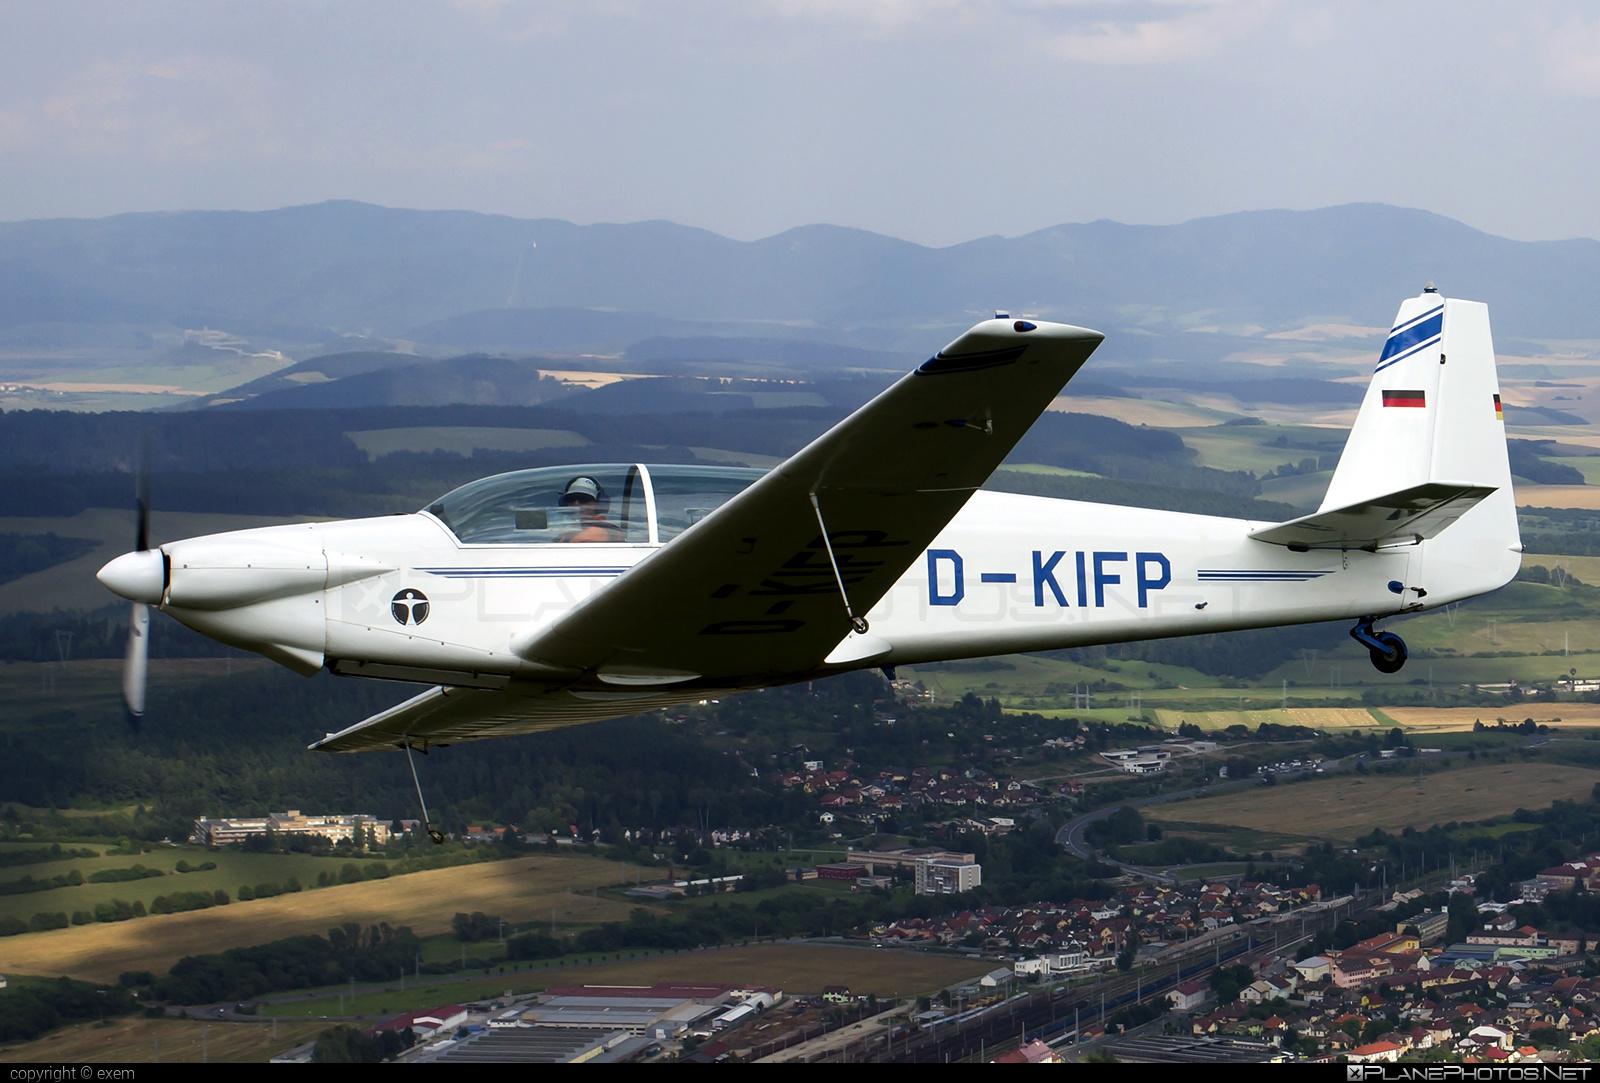 Sportavia-Pützer RF-5B Sperber - D-KIFP operated by Private operator